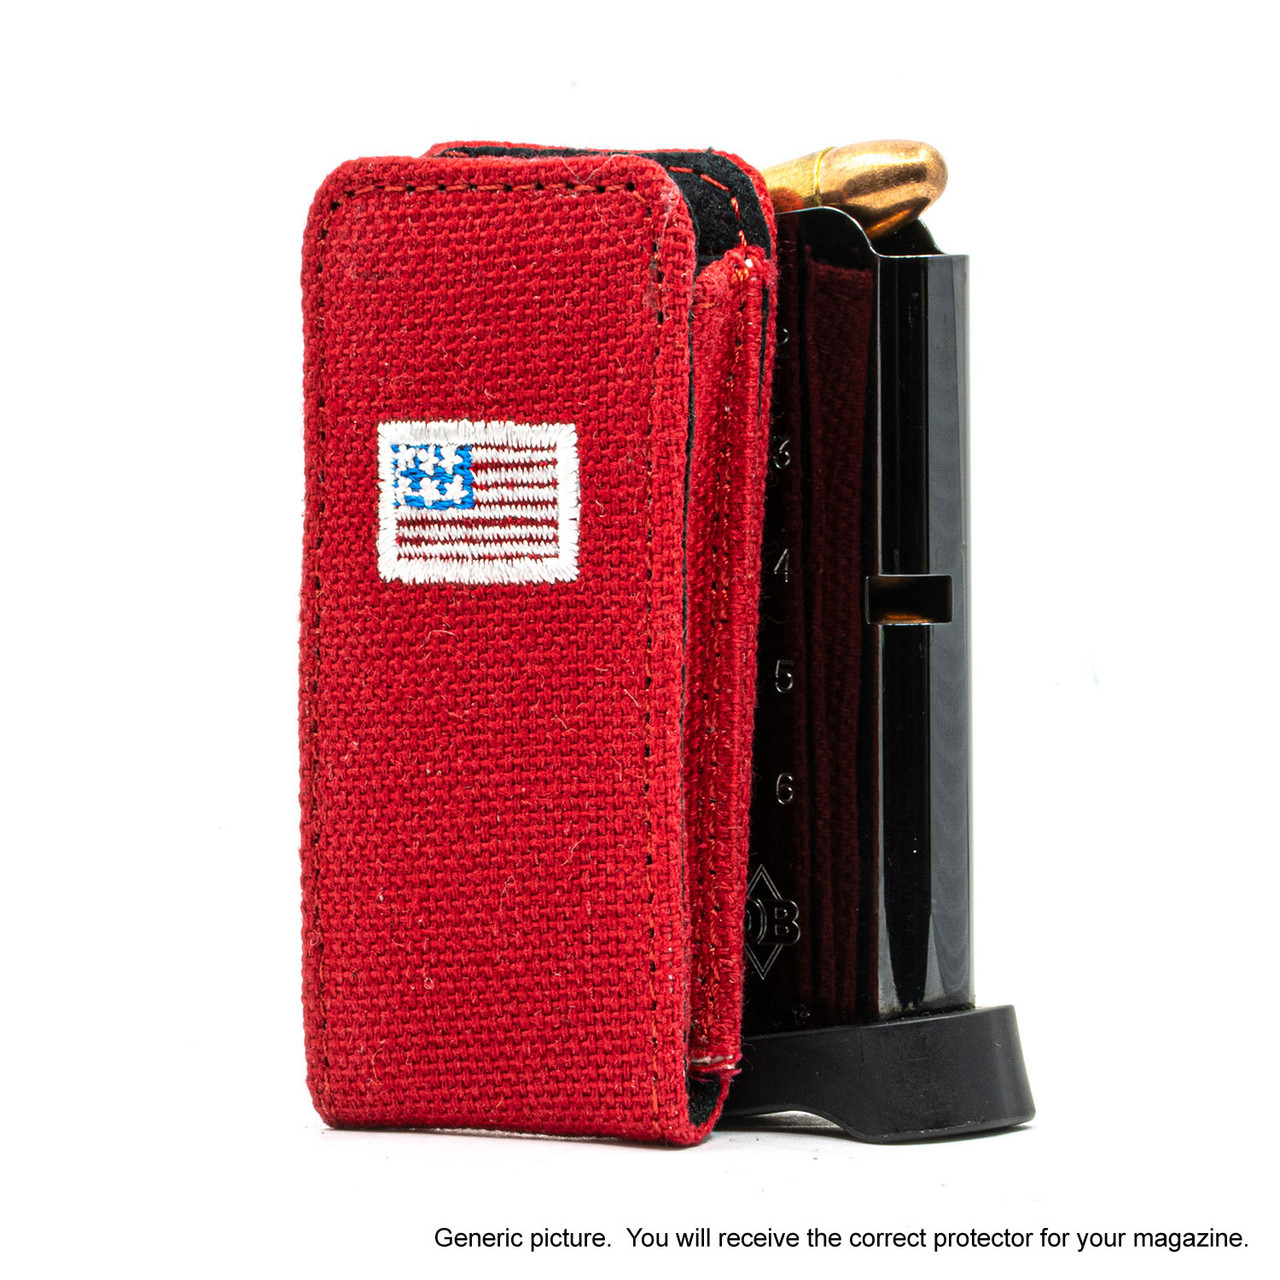 HK VP40 Red Canvas Flag Magazine Pocket Protector